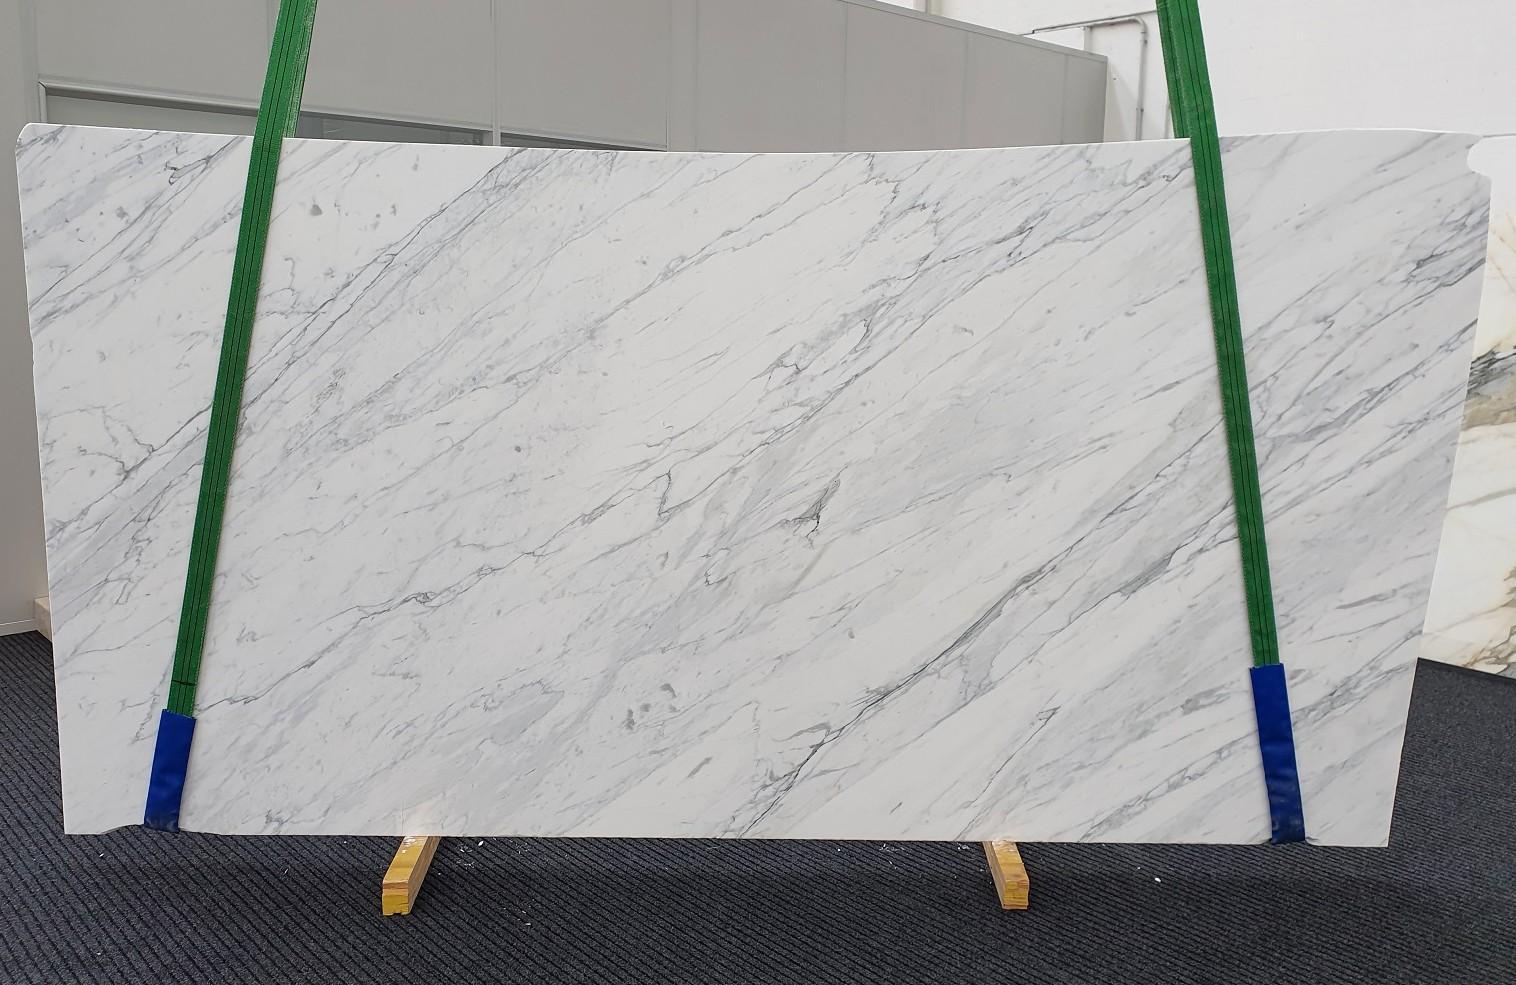 CALACATTA CARRARA Supply Veneto (Italy) honed slabs 1313 , Slab #35 natural marble